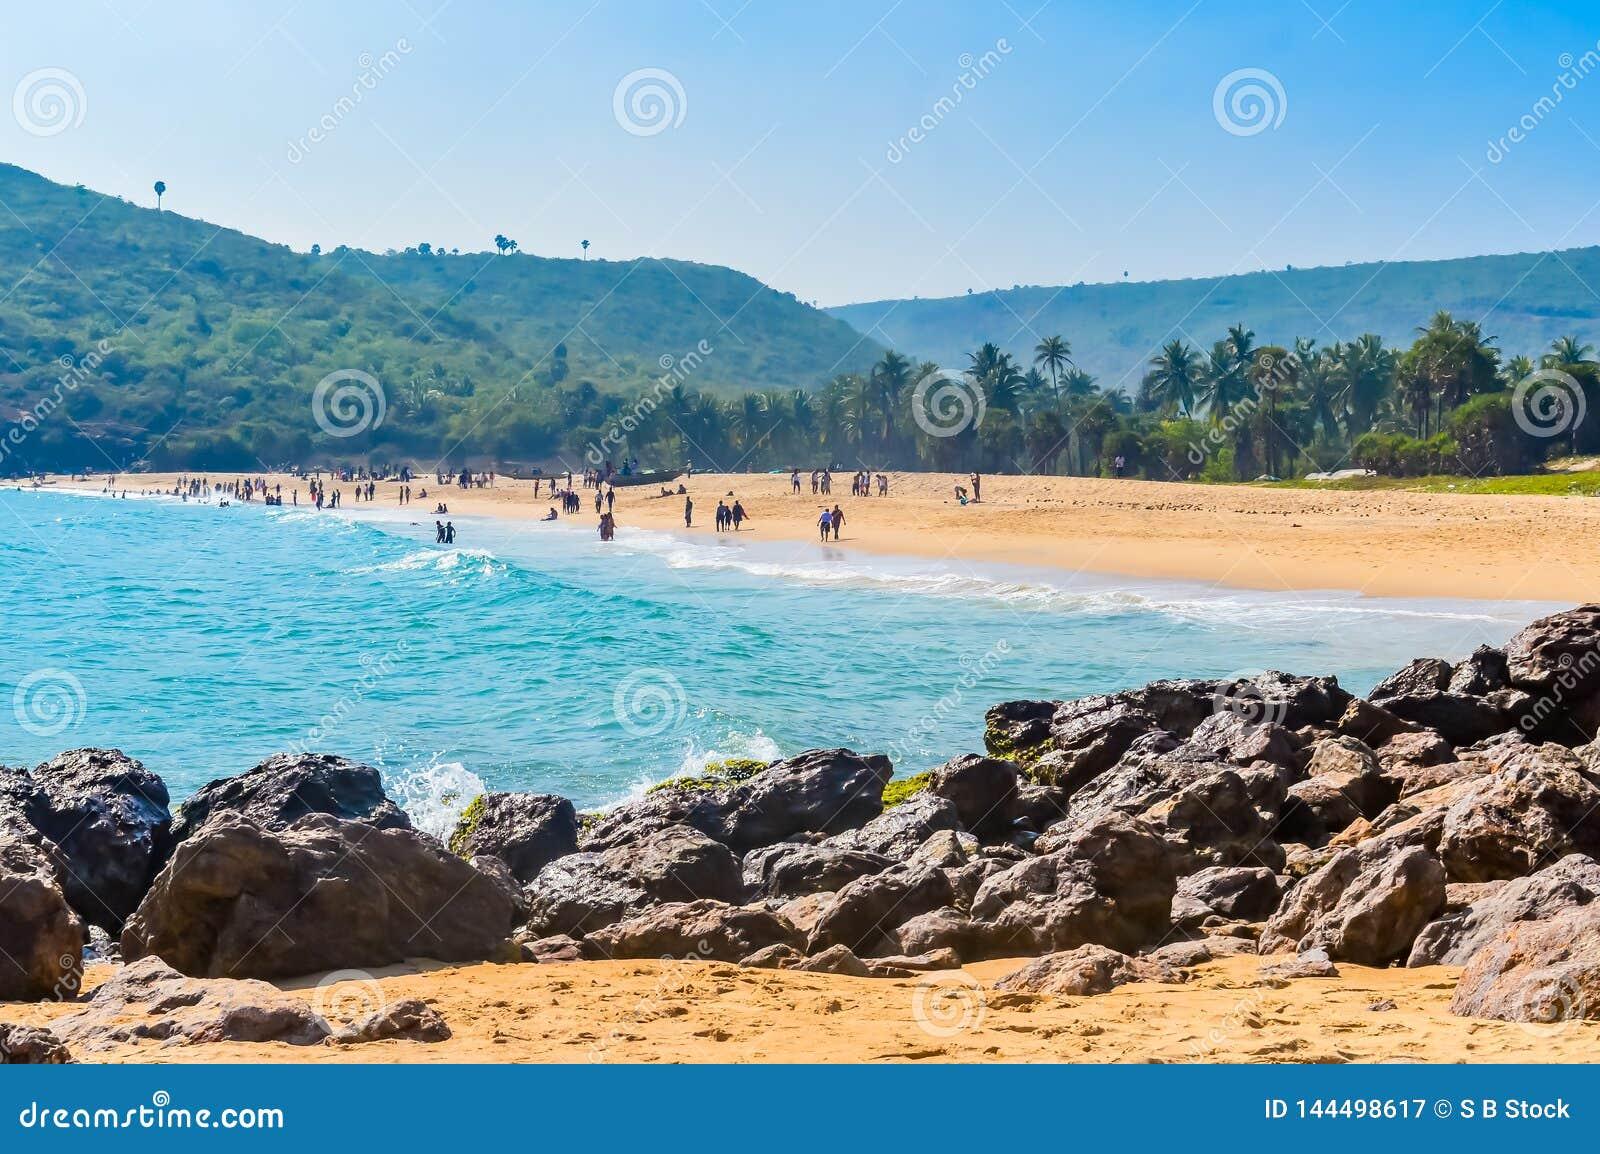 Yaradastrand, Visakhapatnam, India 10 December 2018 - Mensen die en in Yarada-Strand ontspannen genieten van Het Kustgebied is om